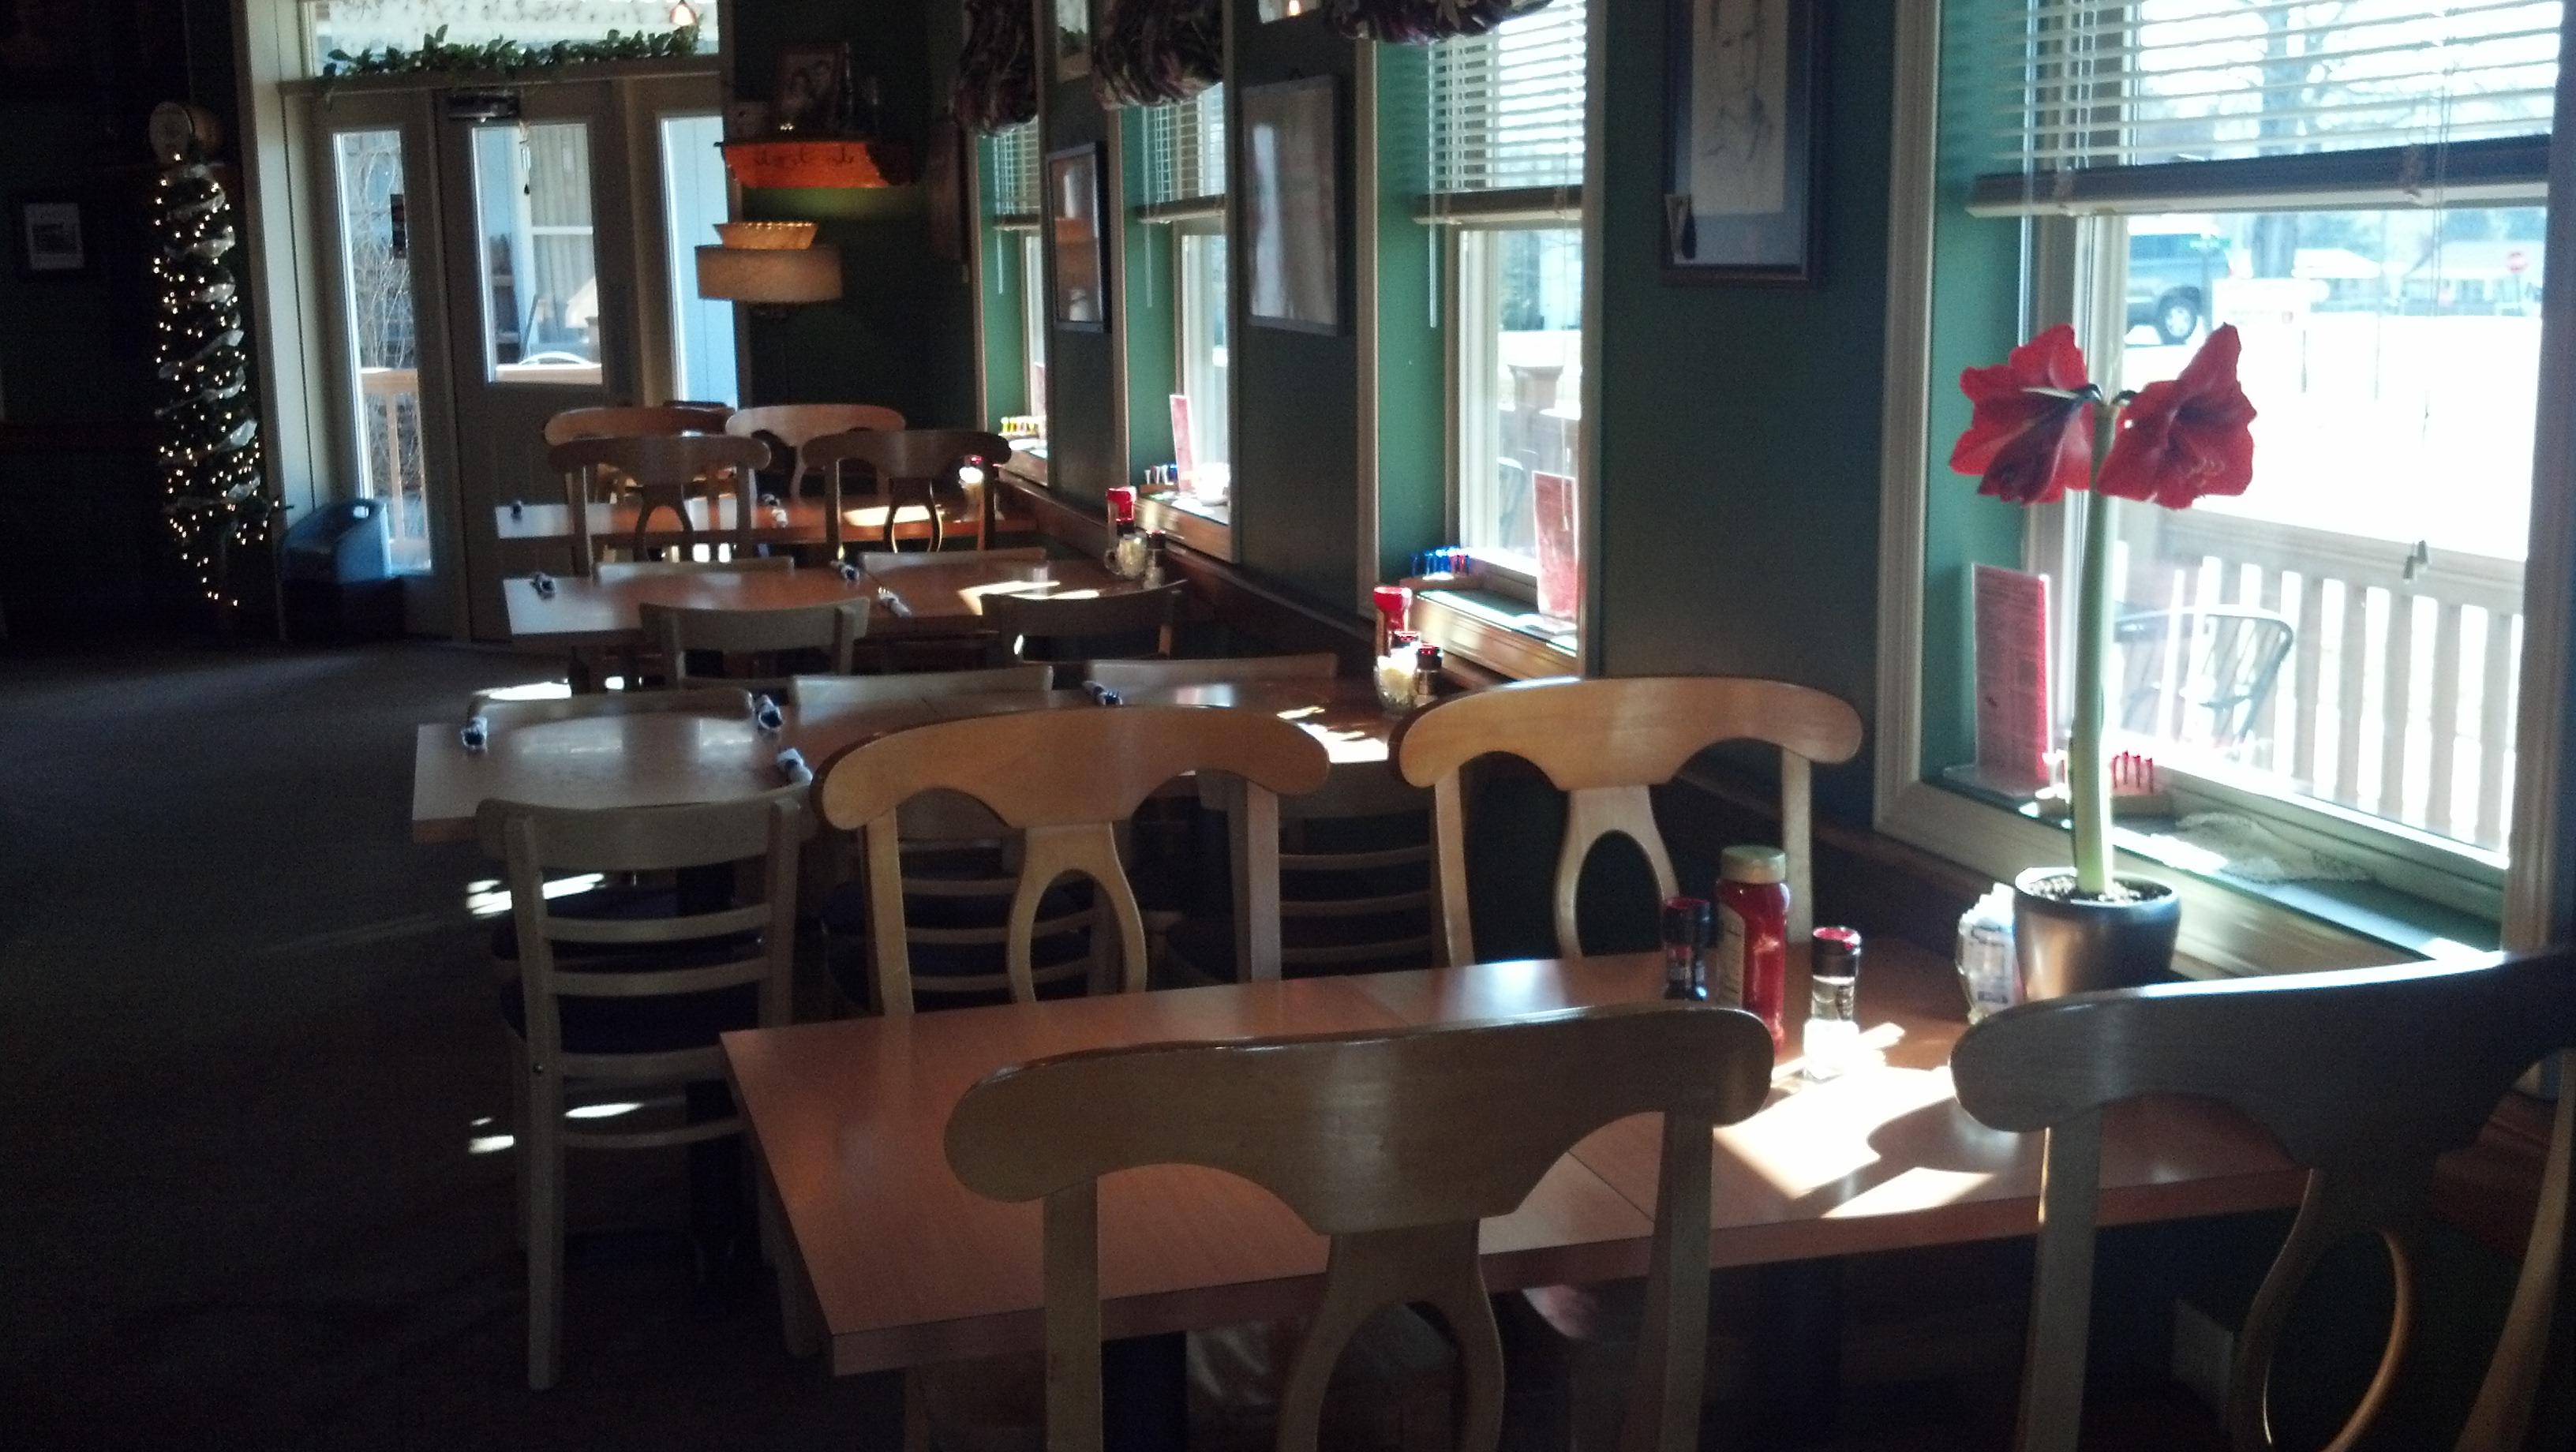 The Ridge Inn, Laurelville OH